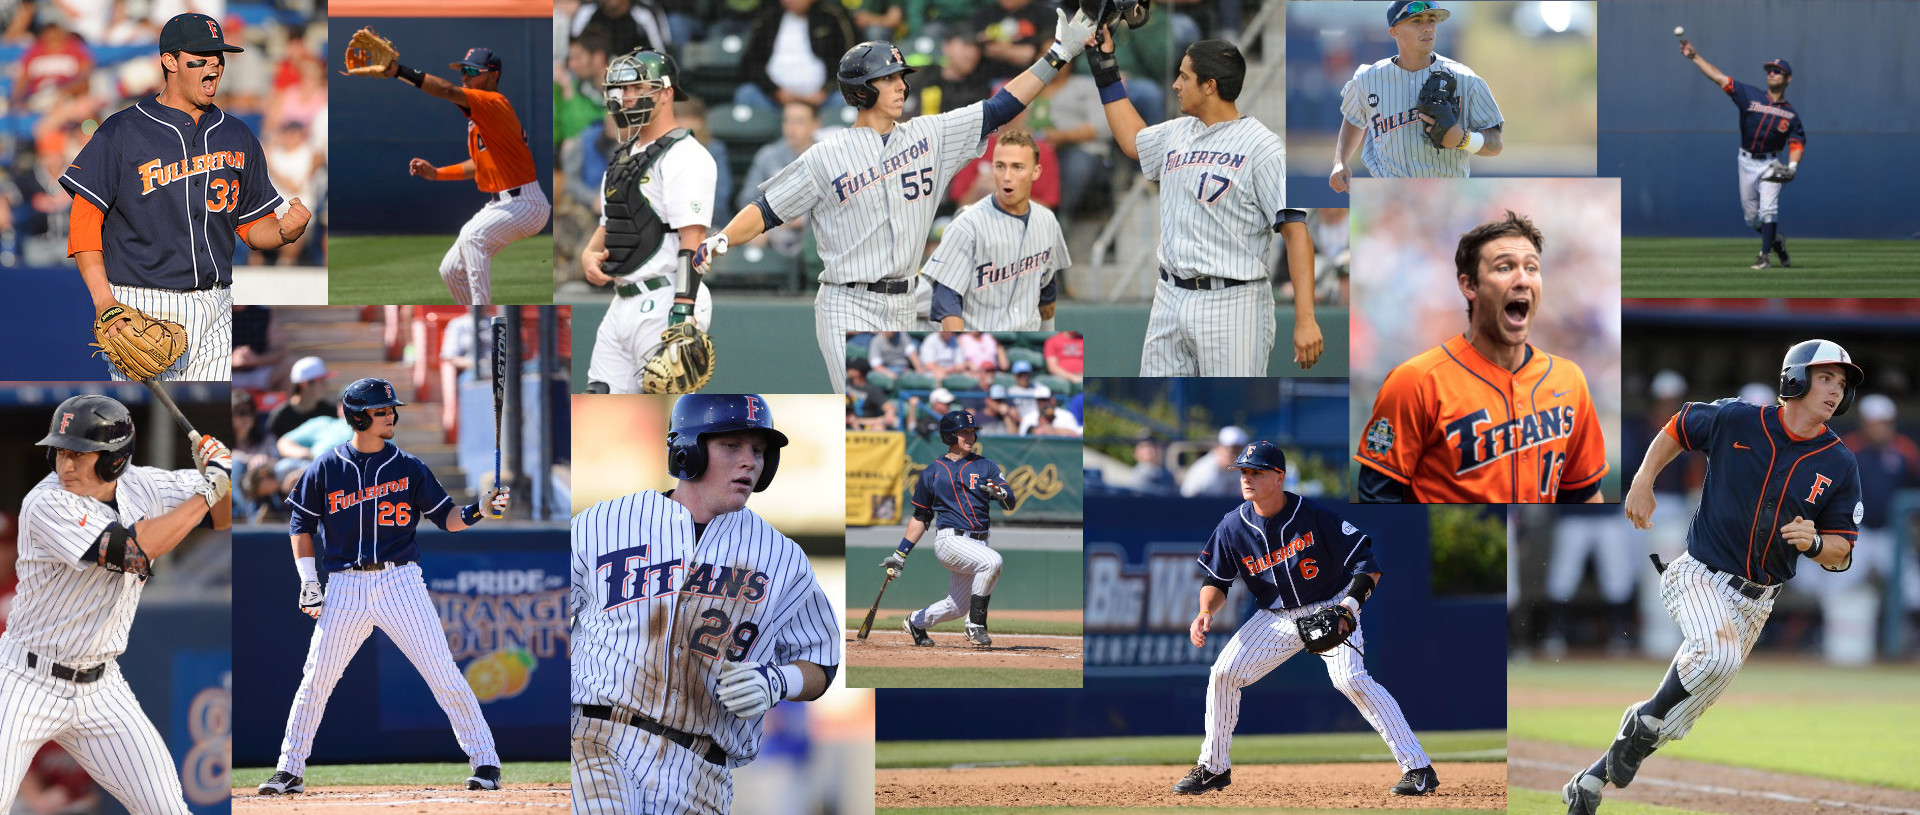 Cal State Fullerton Baseball Batters